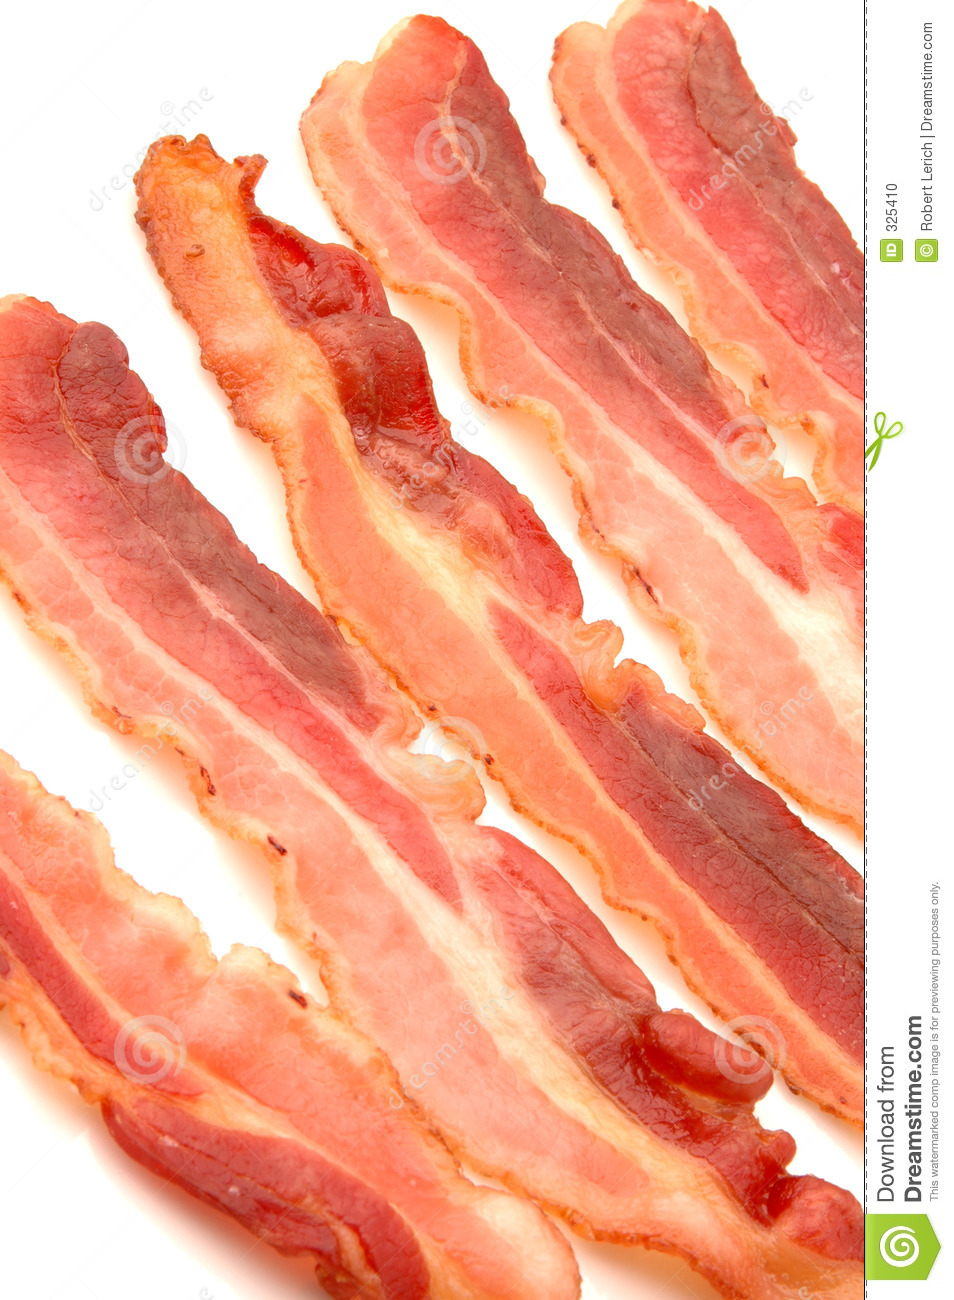 Bacon Clip Art Page 1.